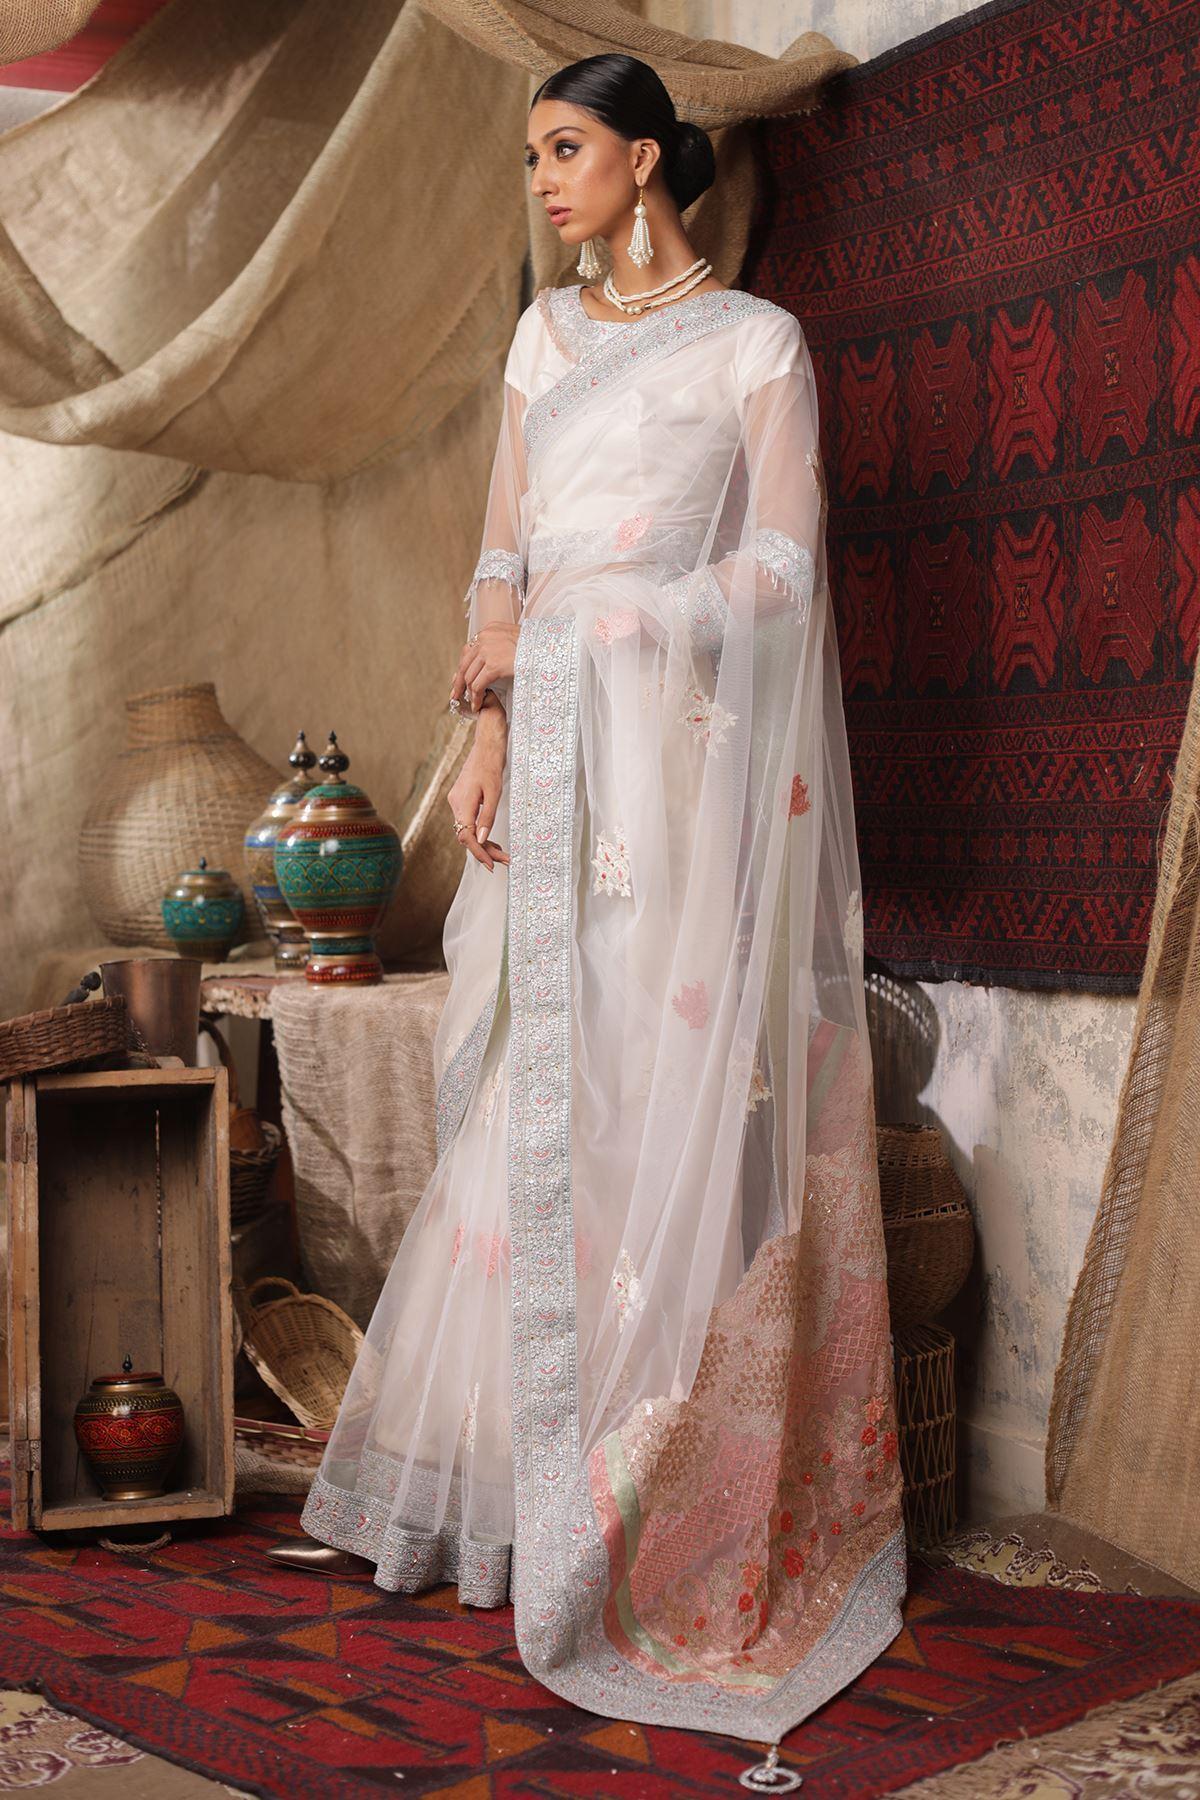 Moazzam Khan Formal 3 PC Saree Blouse Petti Coat in White for Women